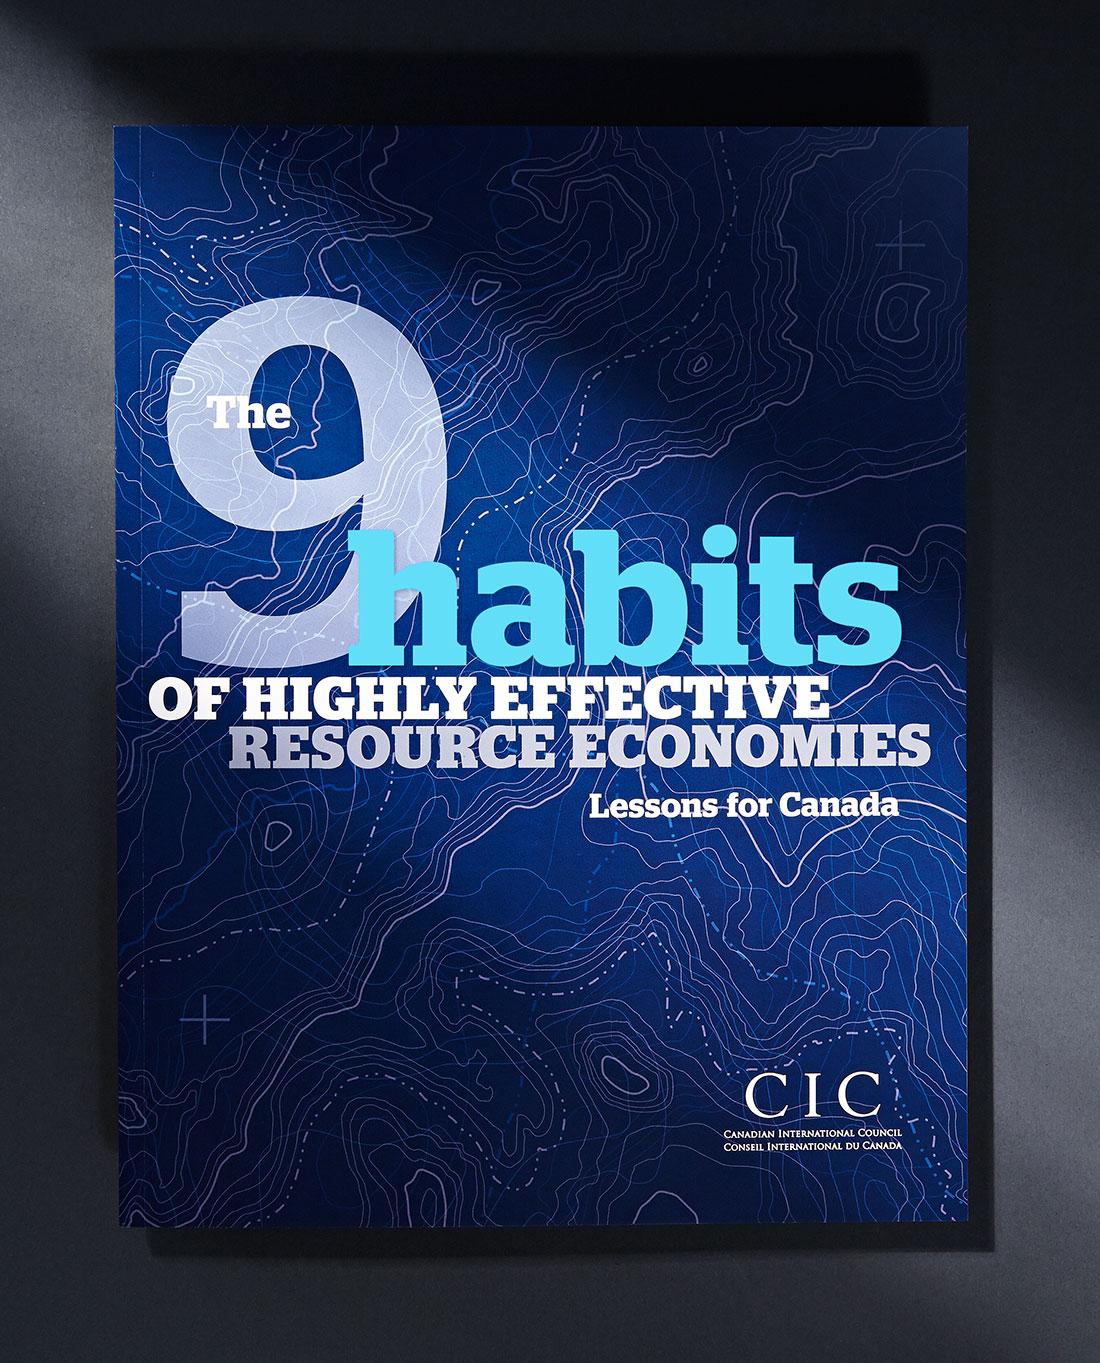 CIC-9-Habits-2012_01